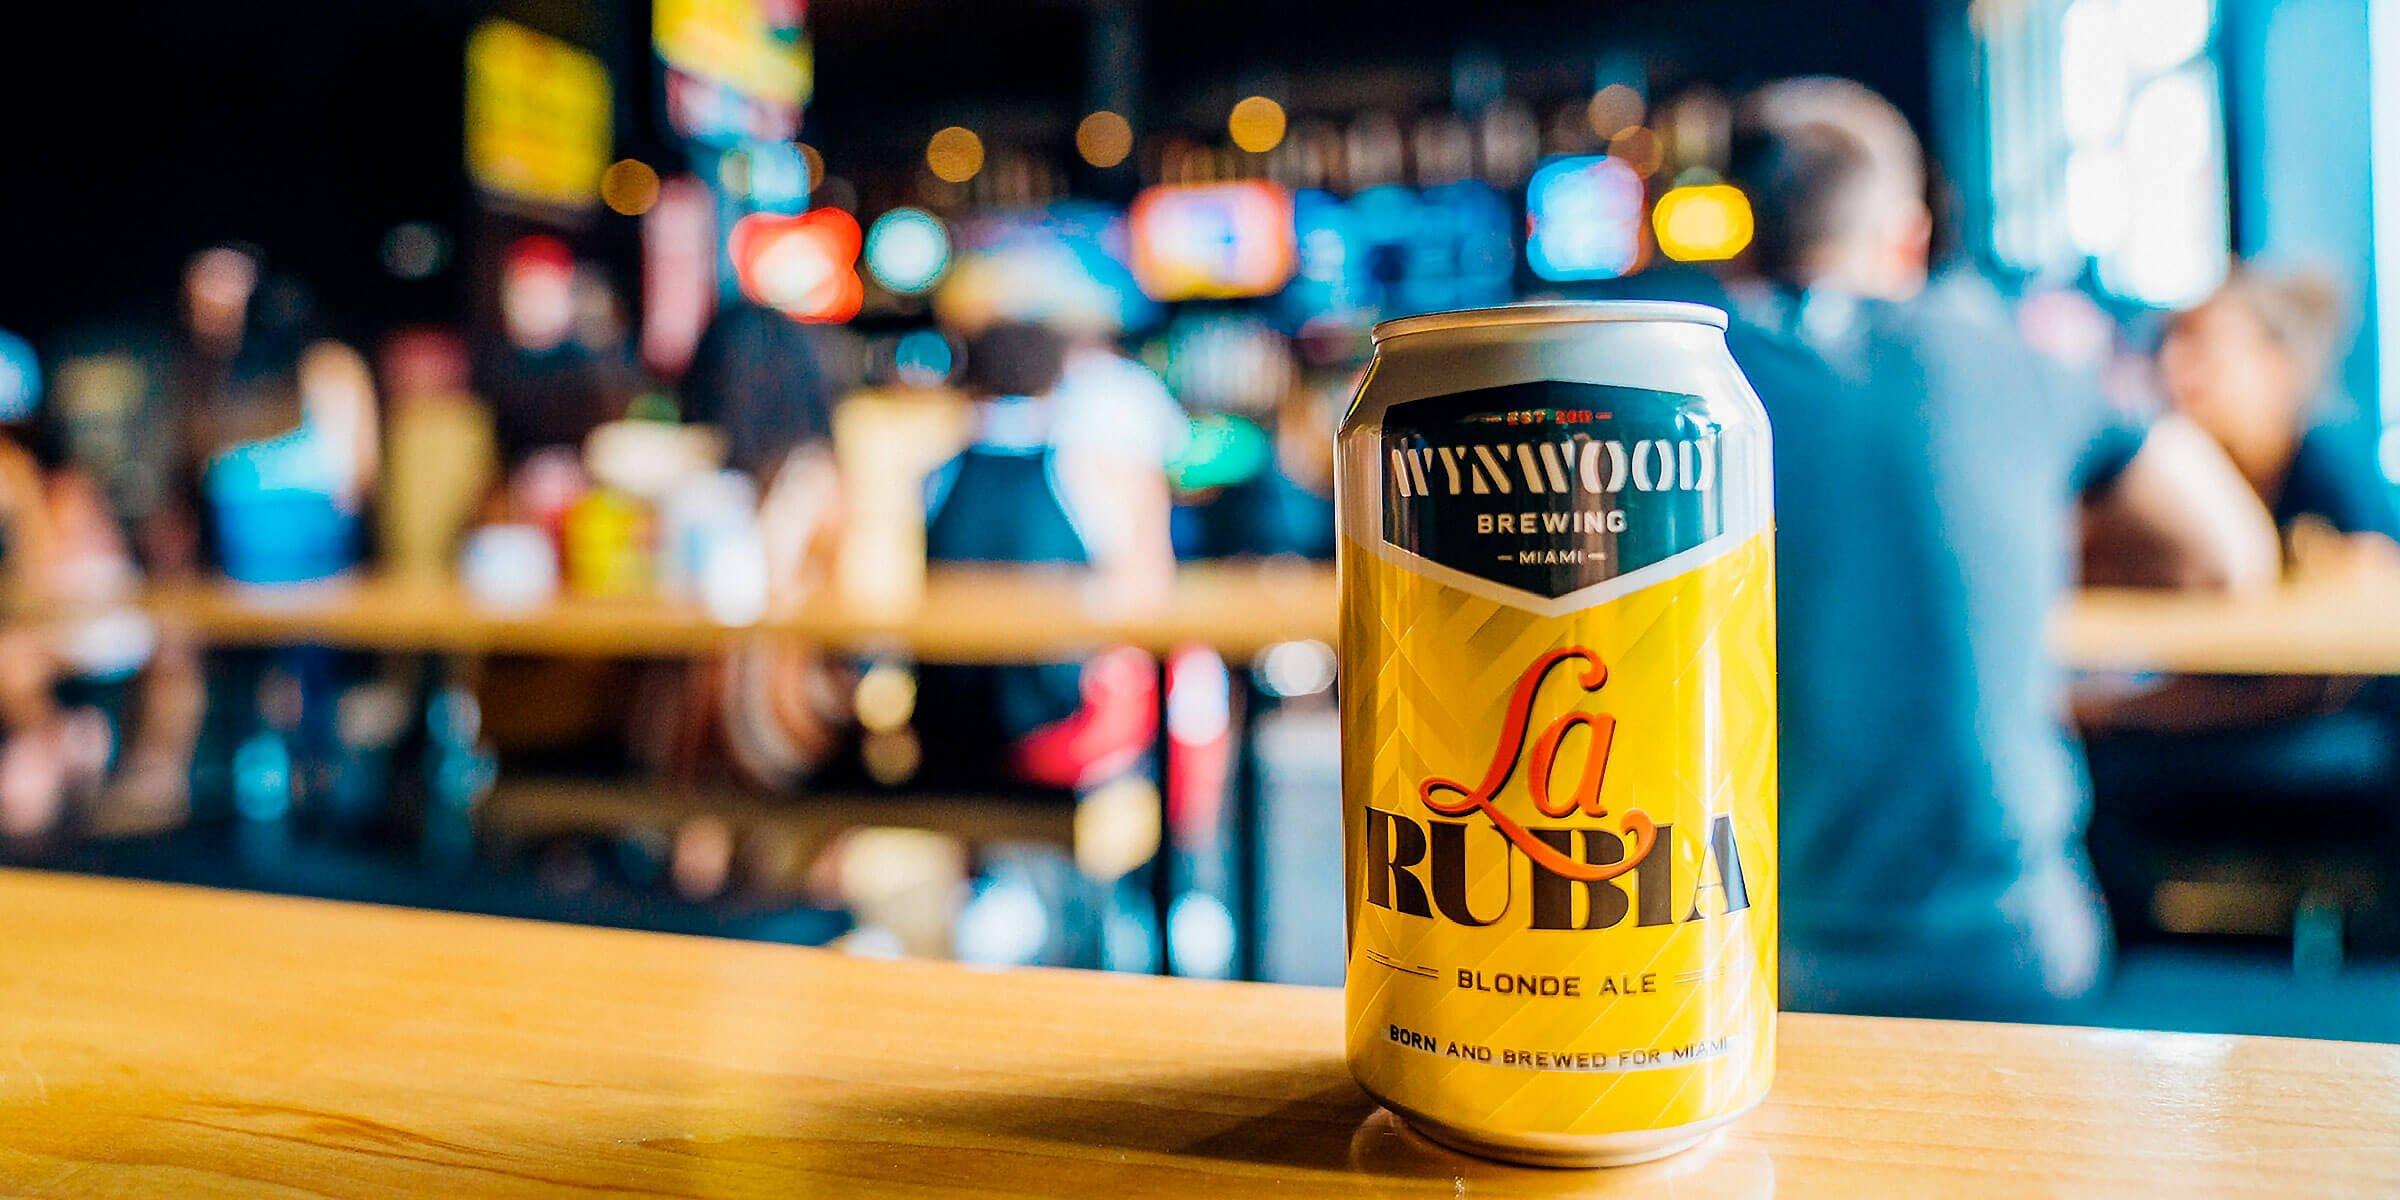 A 12 oz. can of the La Rubia Blonde Ale by Wynwood Brewing Company